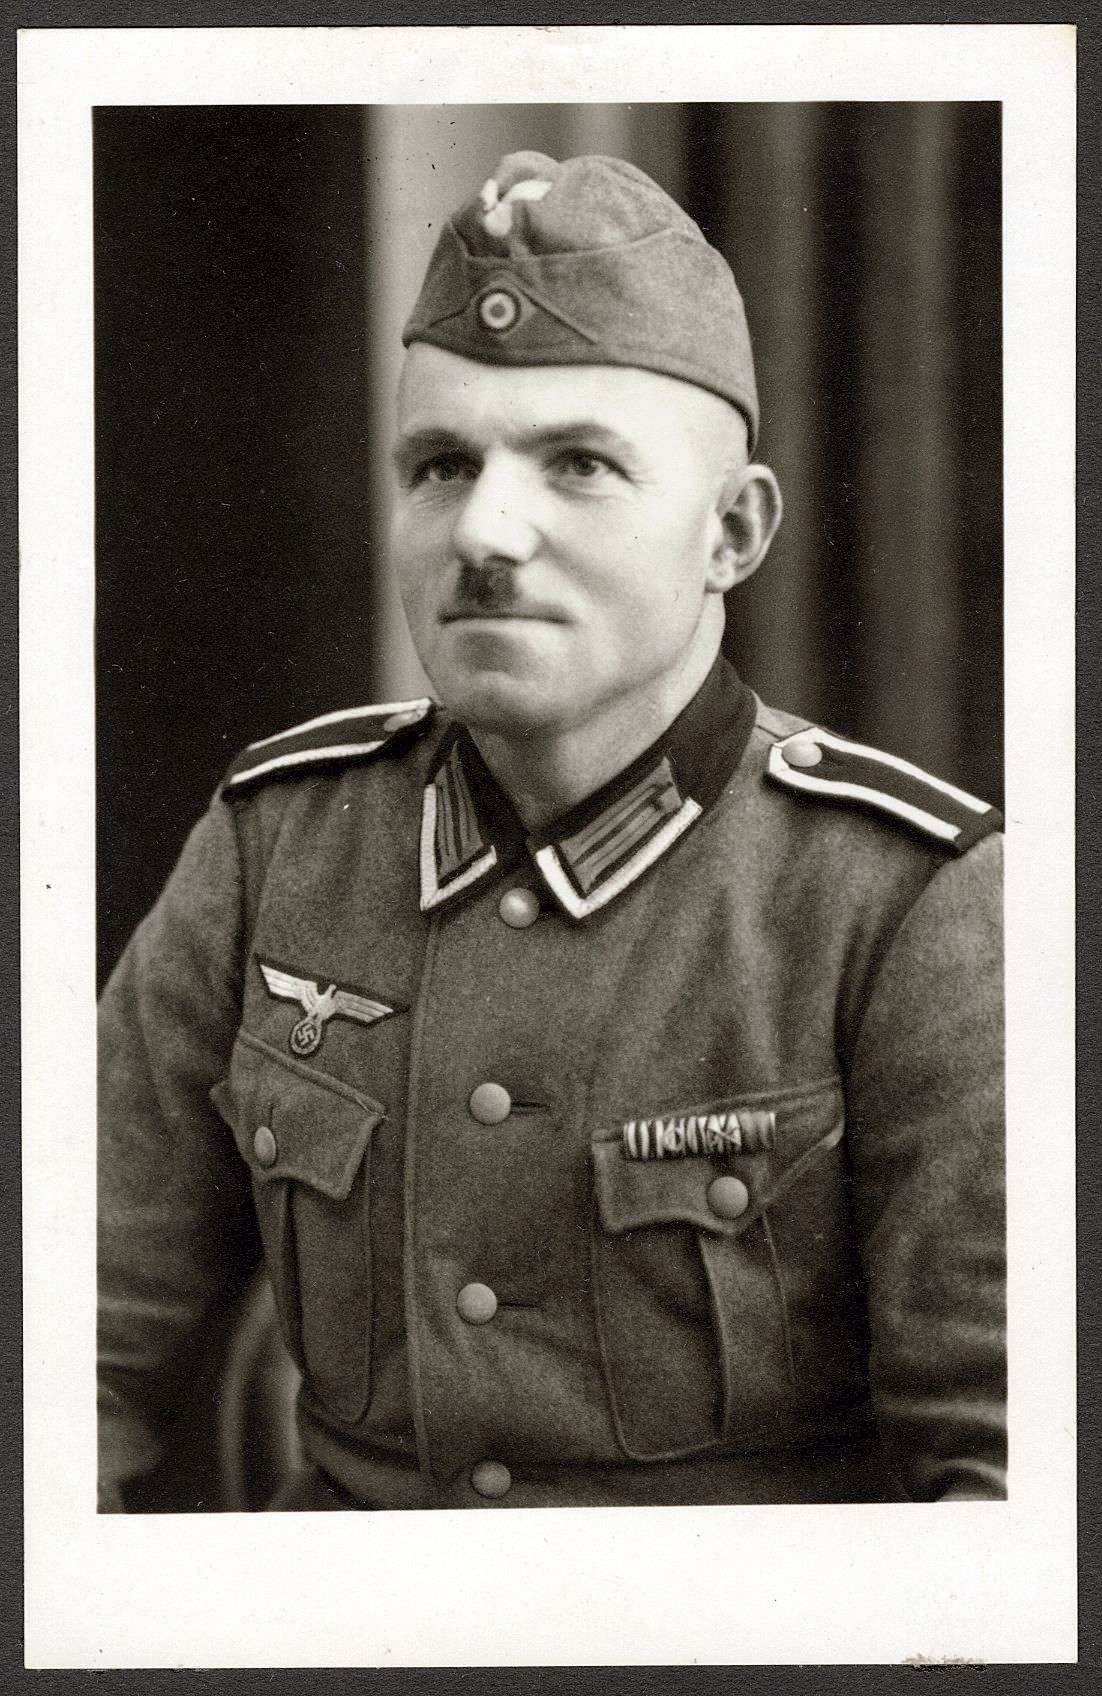 Rösch, Markus, Bild 1